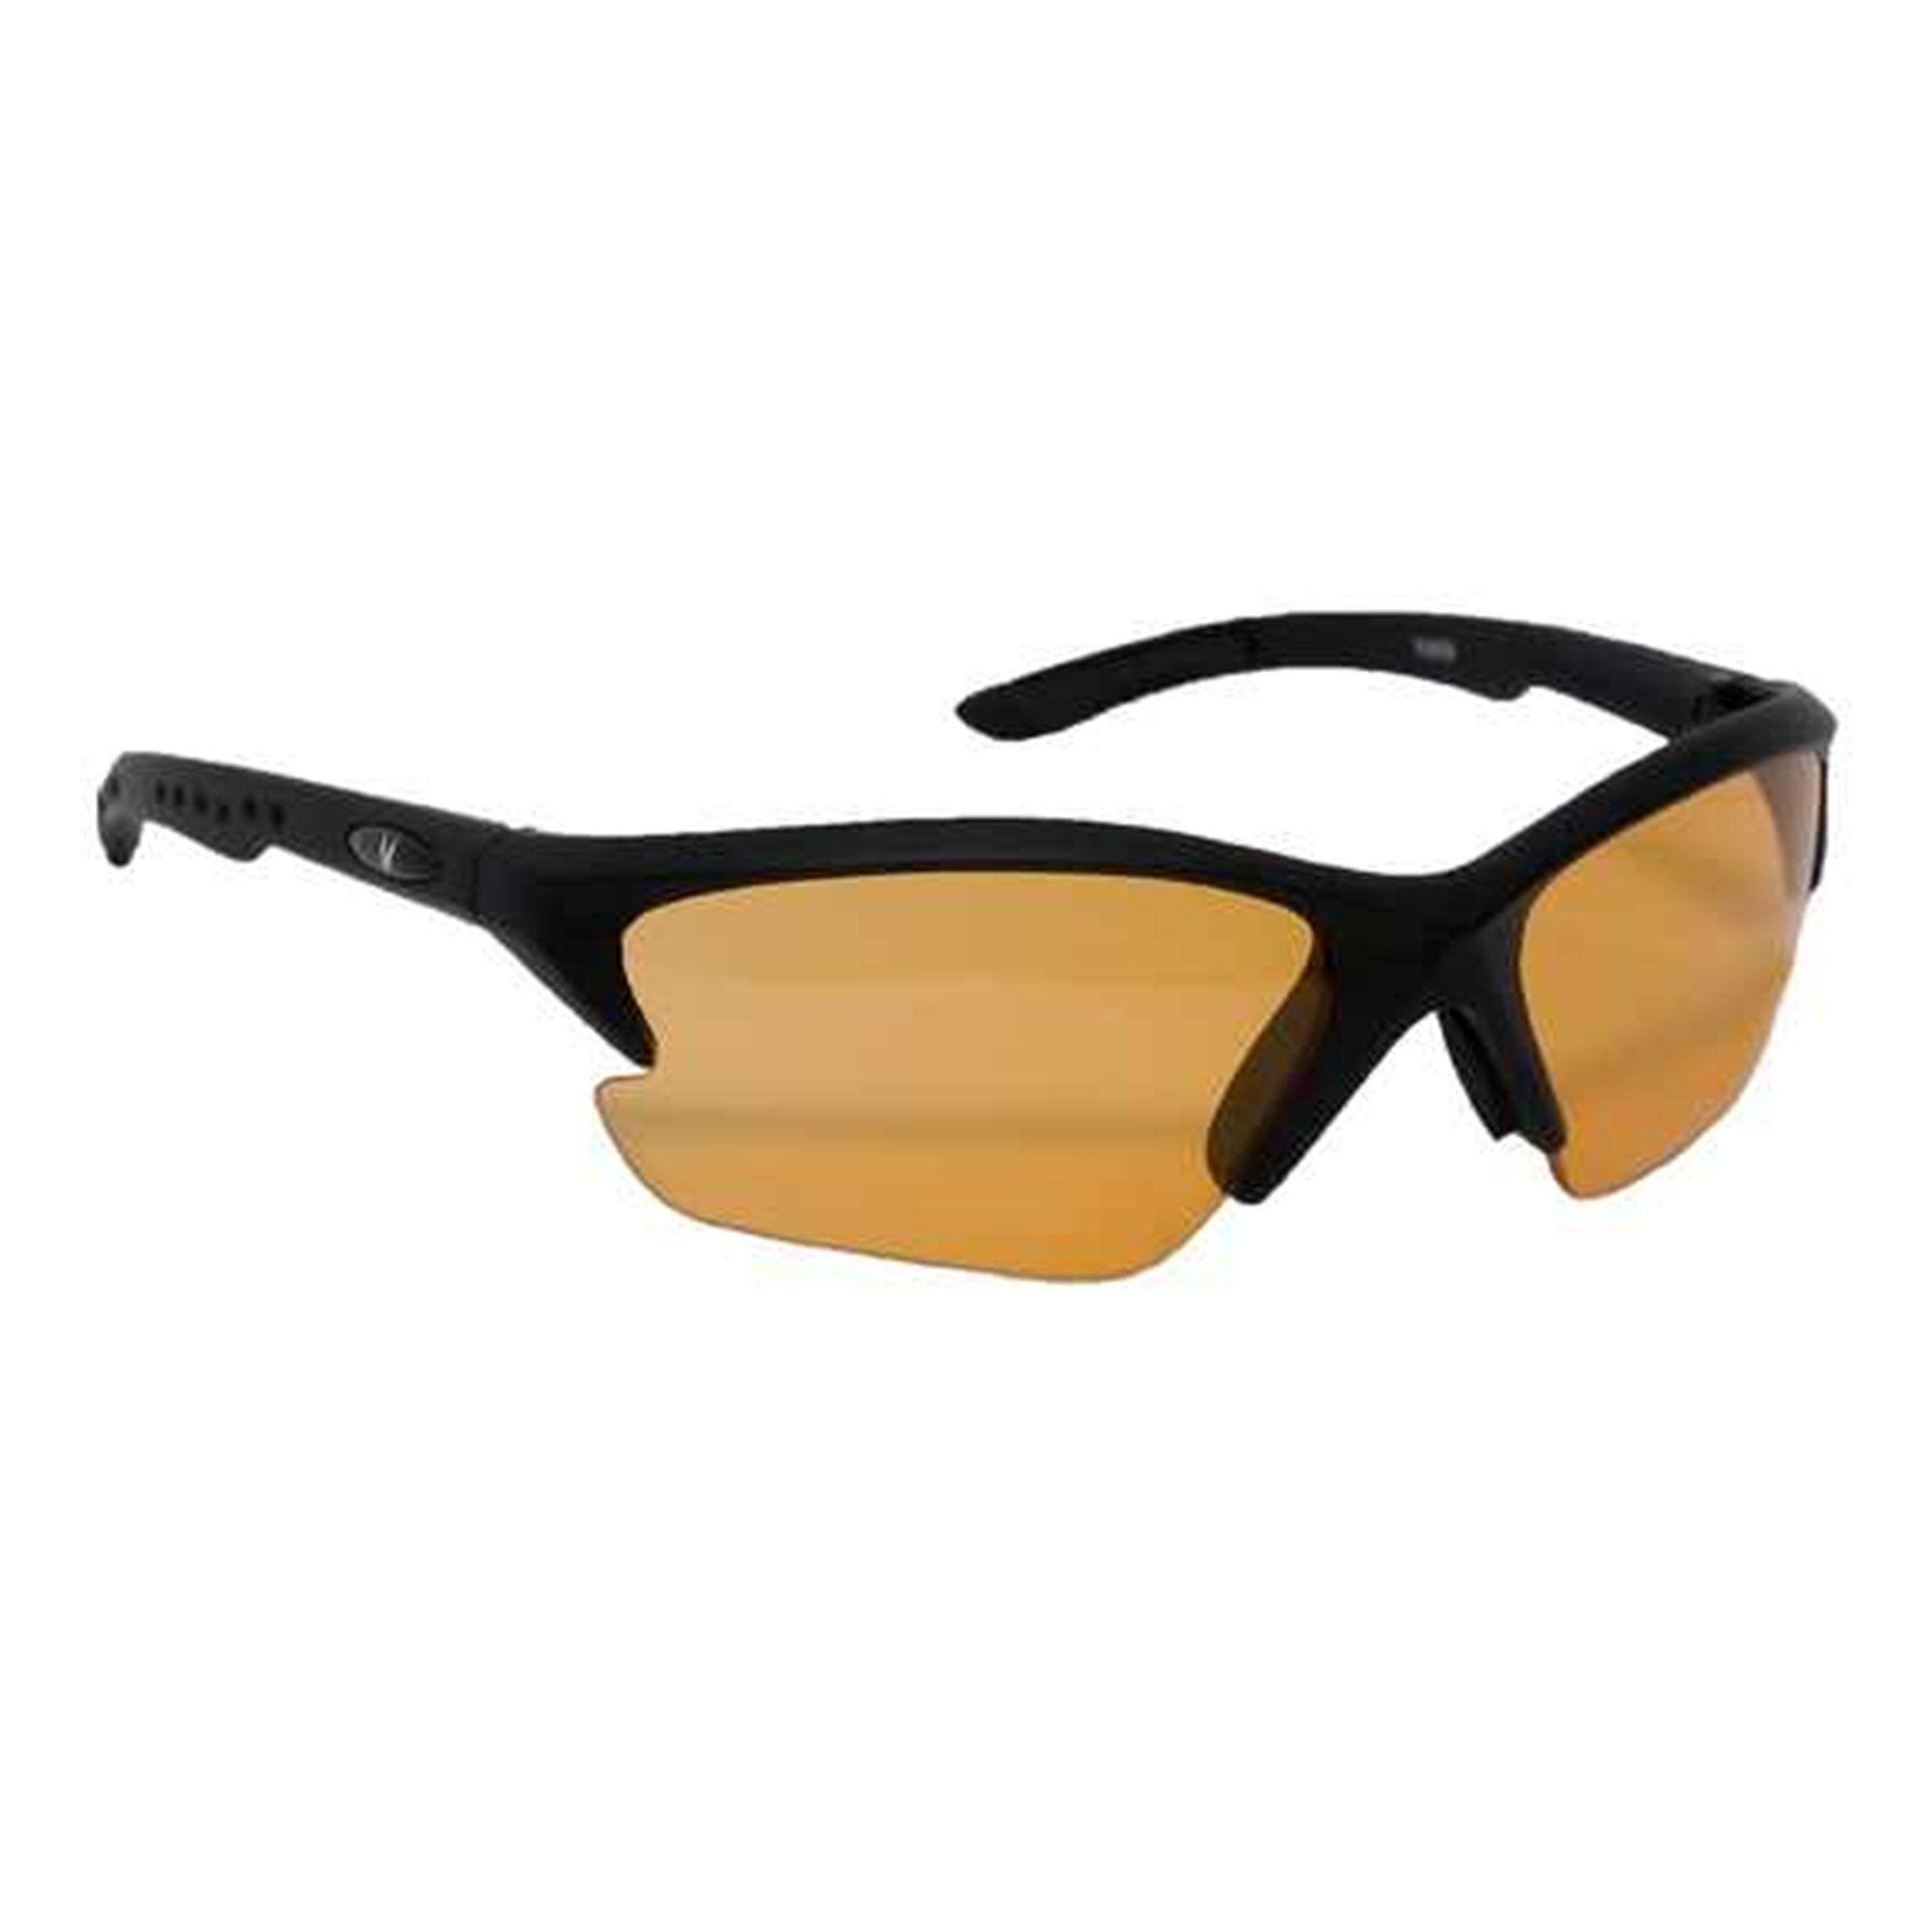 Vinci Black Multilens Youth/Womens Sport Sunglasses for